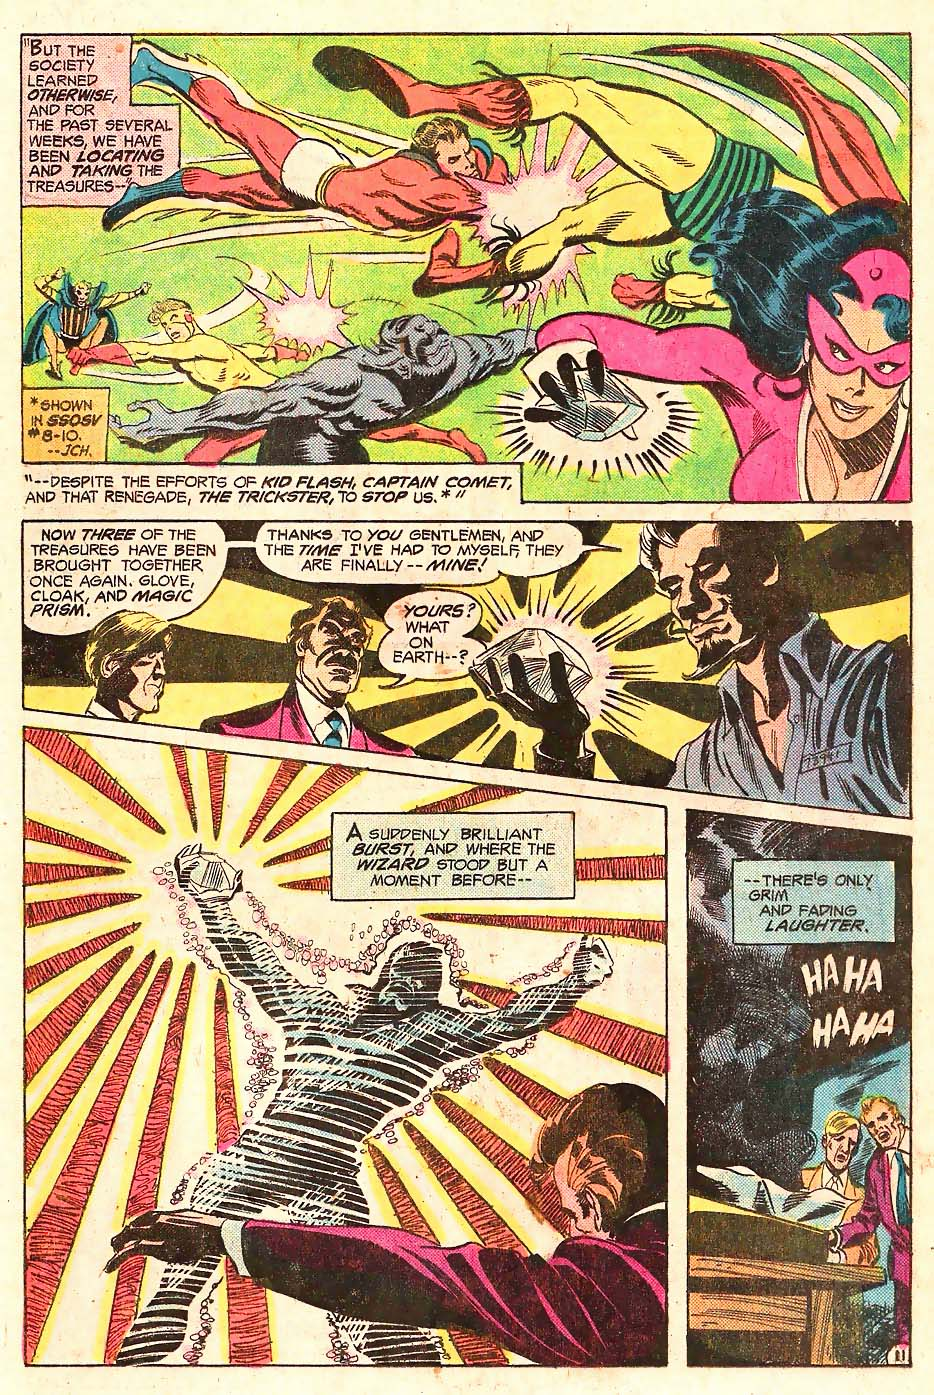 Read online Secret Society of Super-Villains comic -  Issue #11 - 12